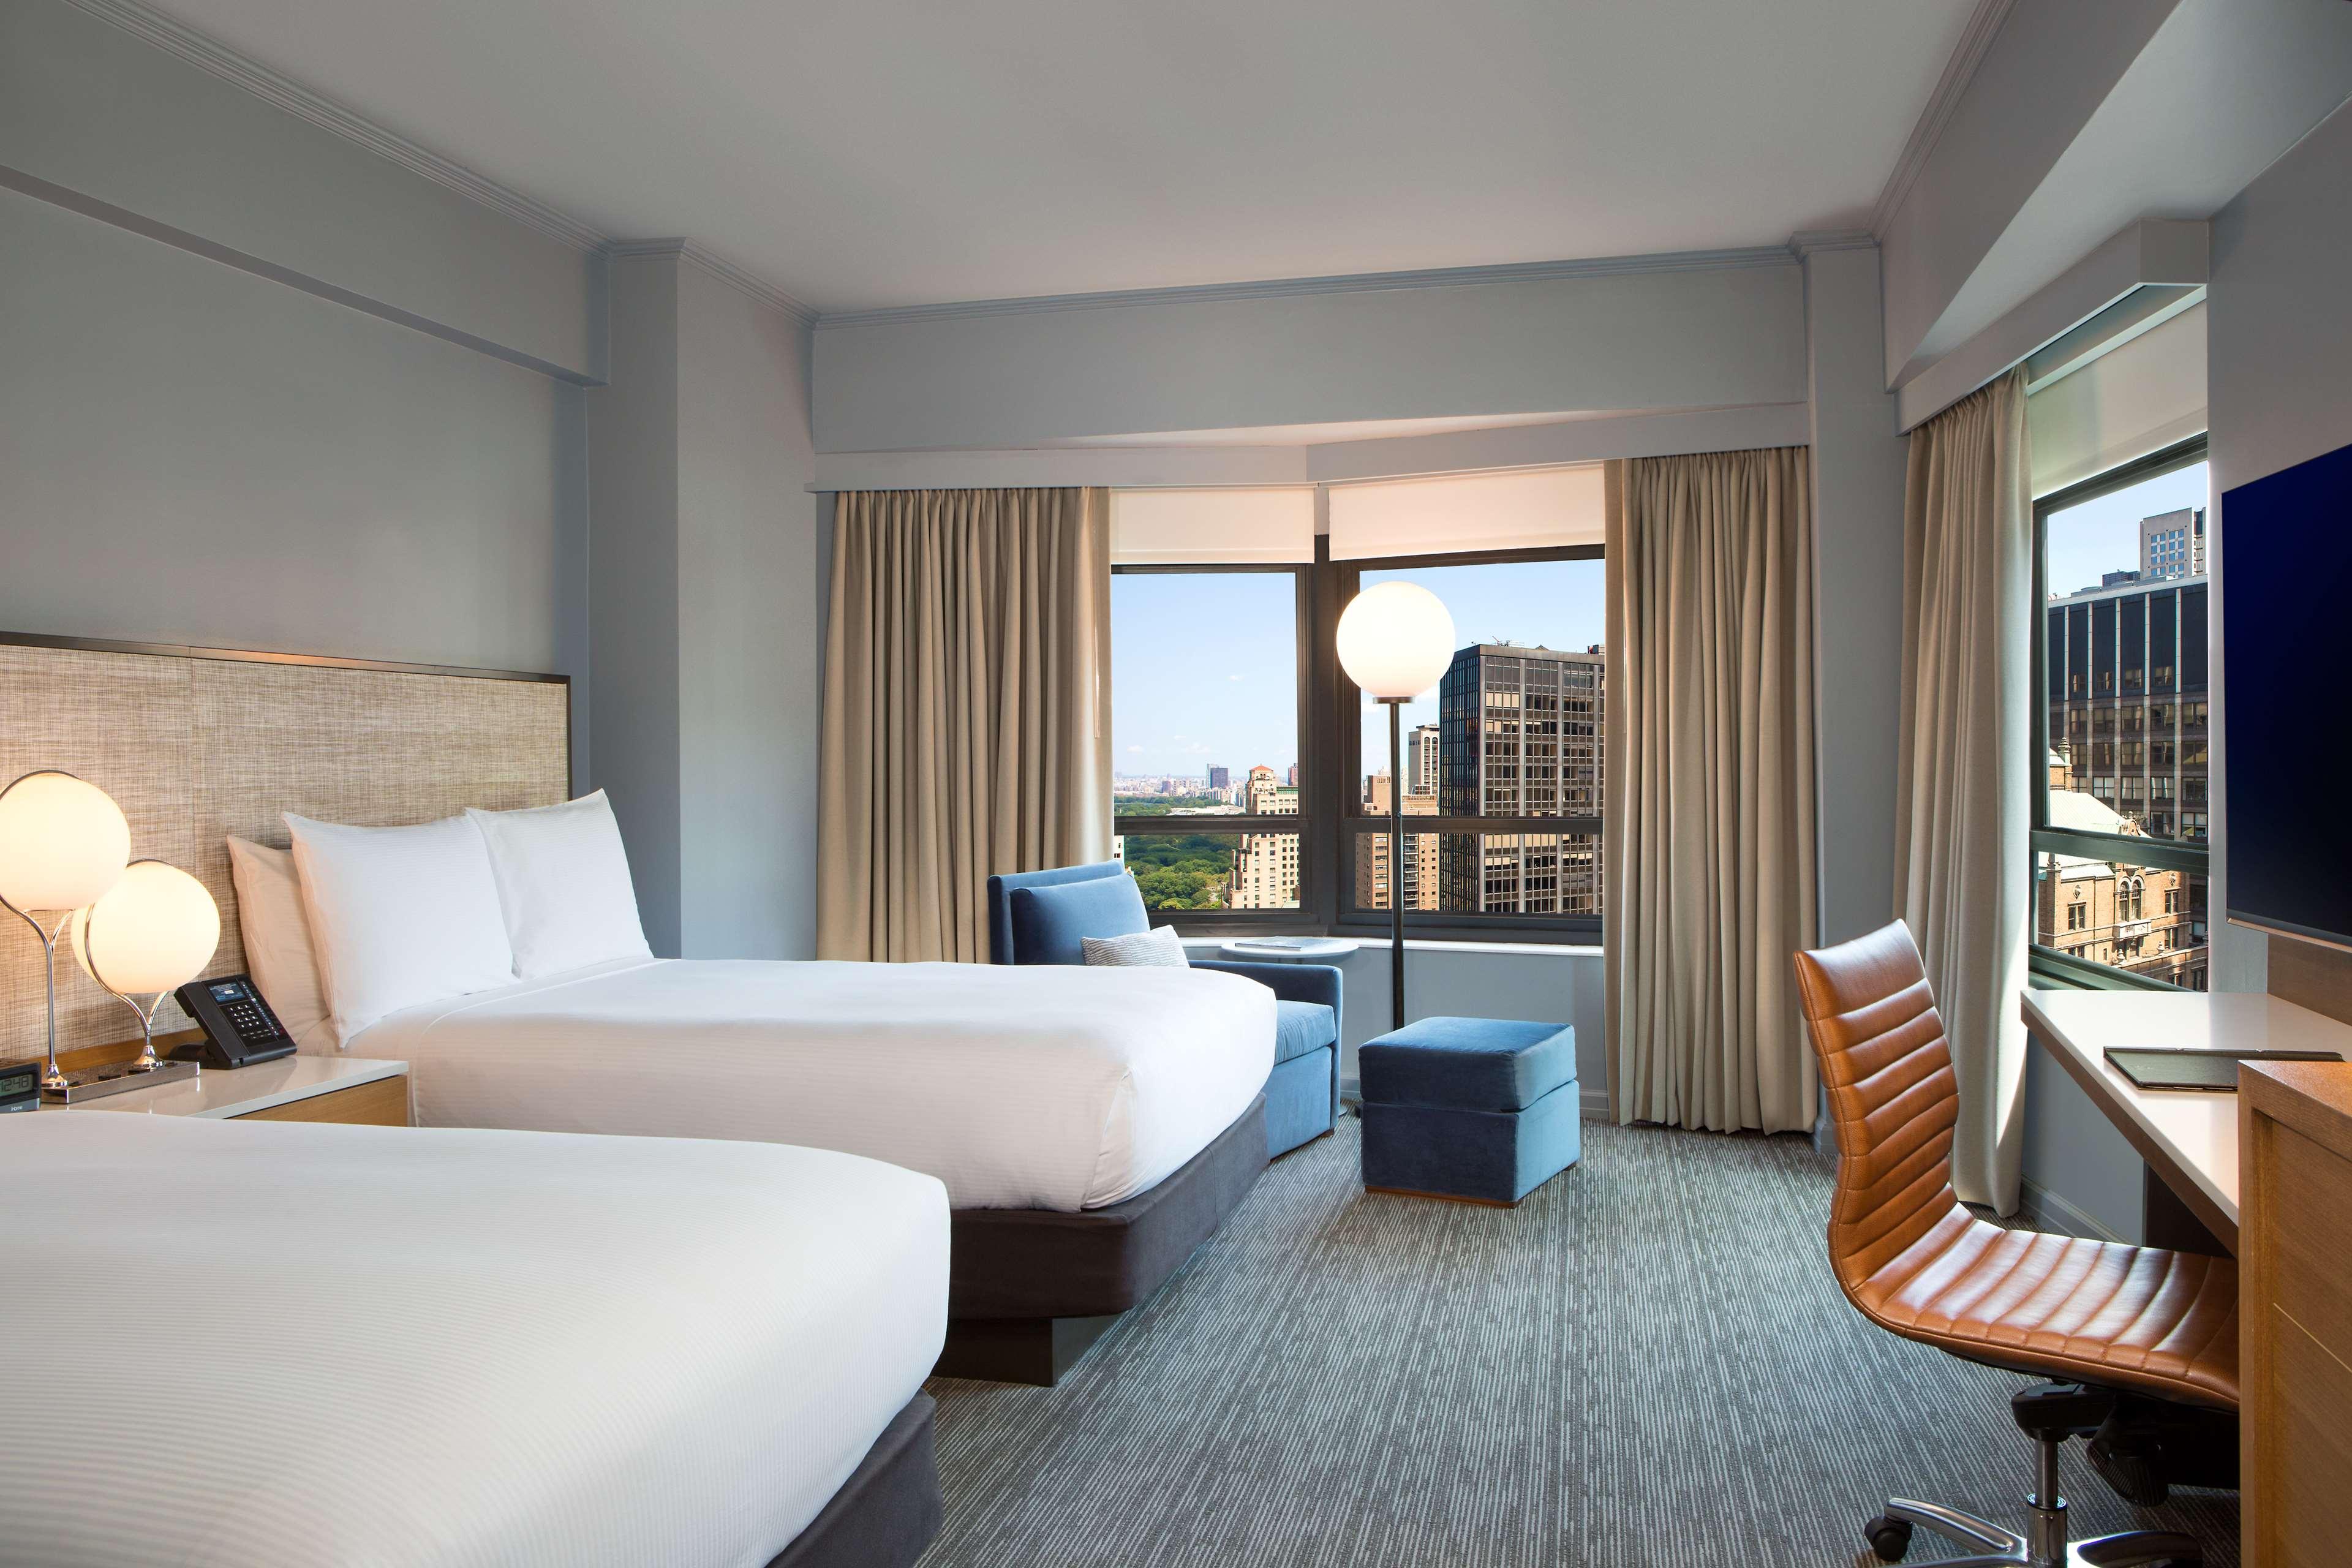 New York Hilton Midtown image 17